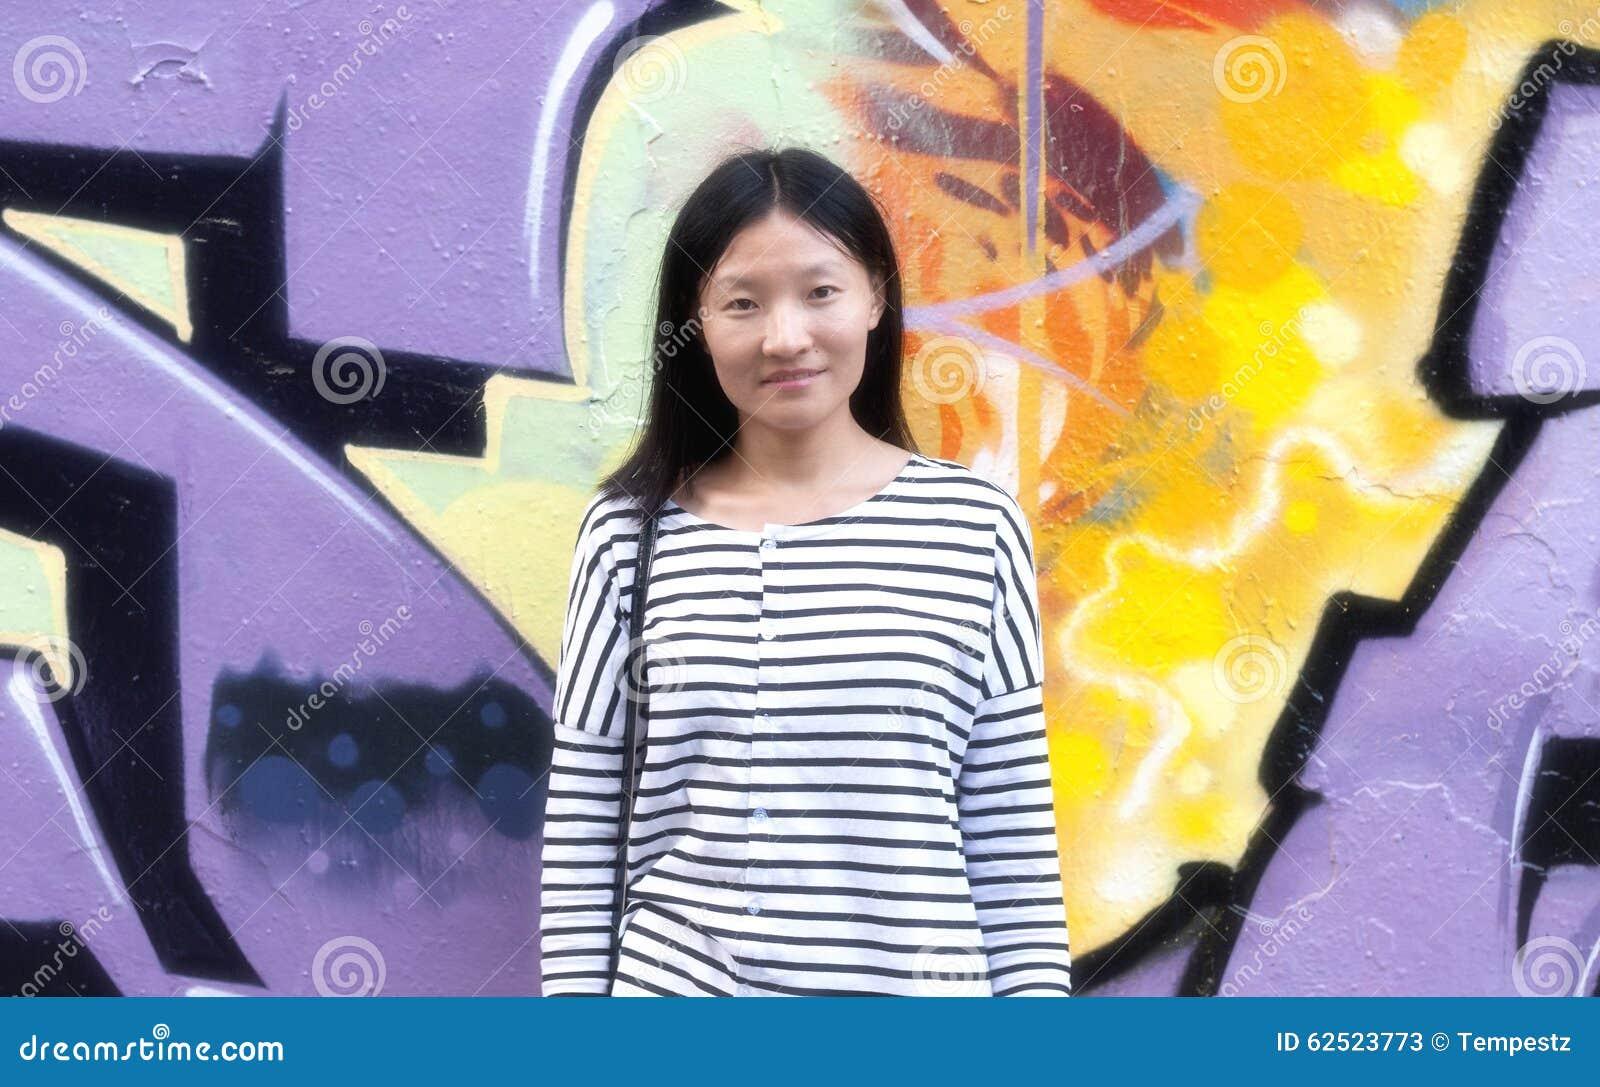 Chinese woman against urban art wall